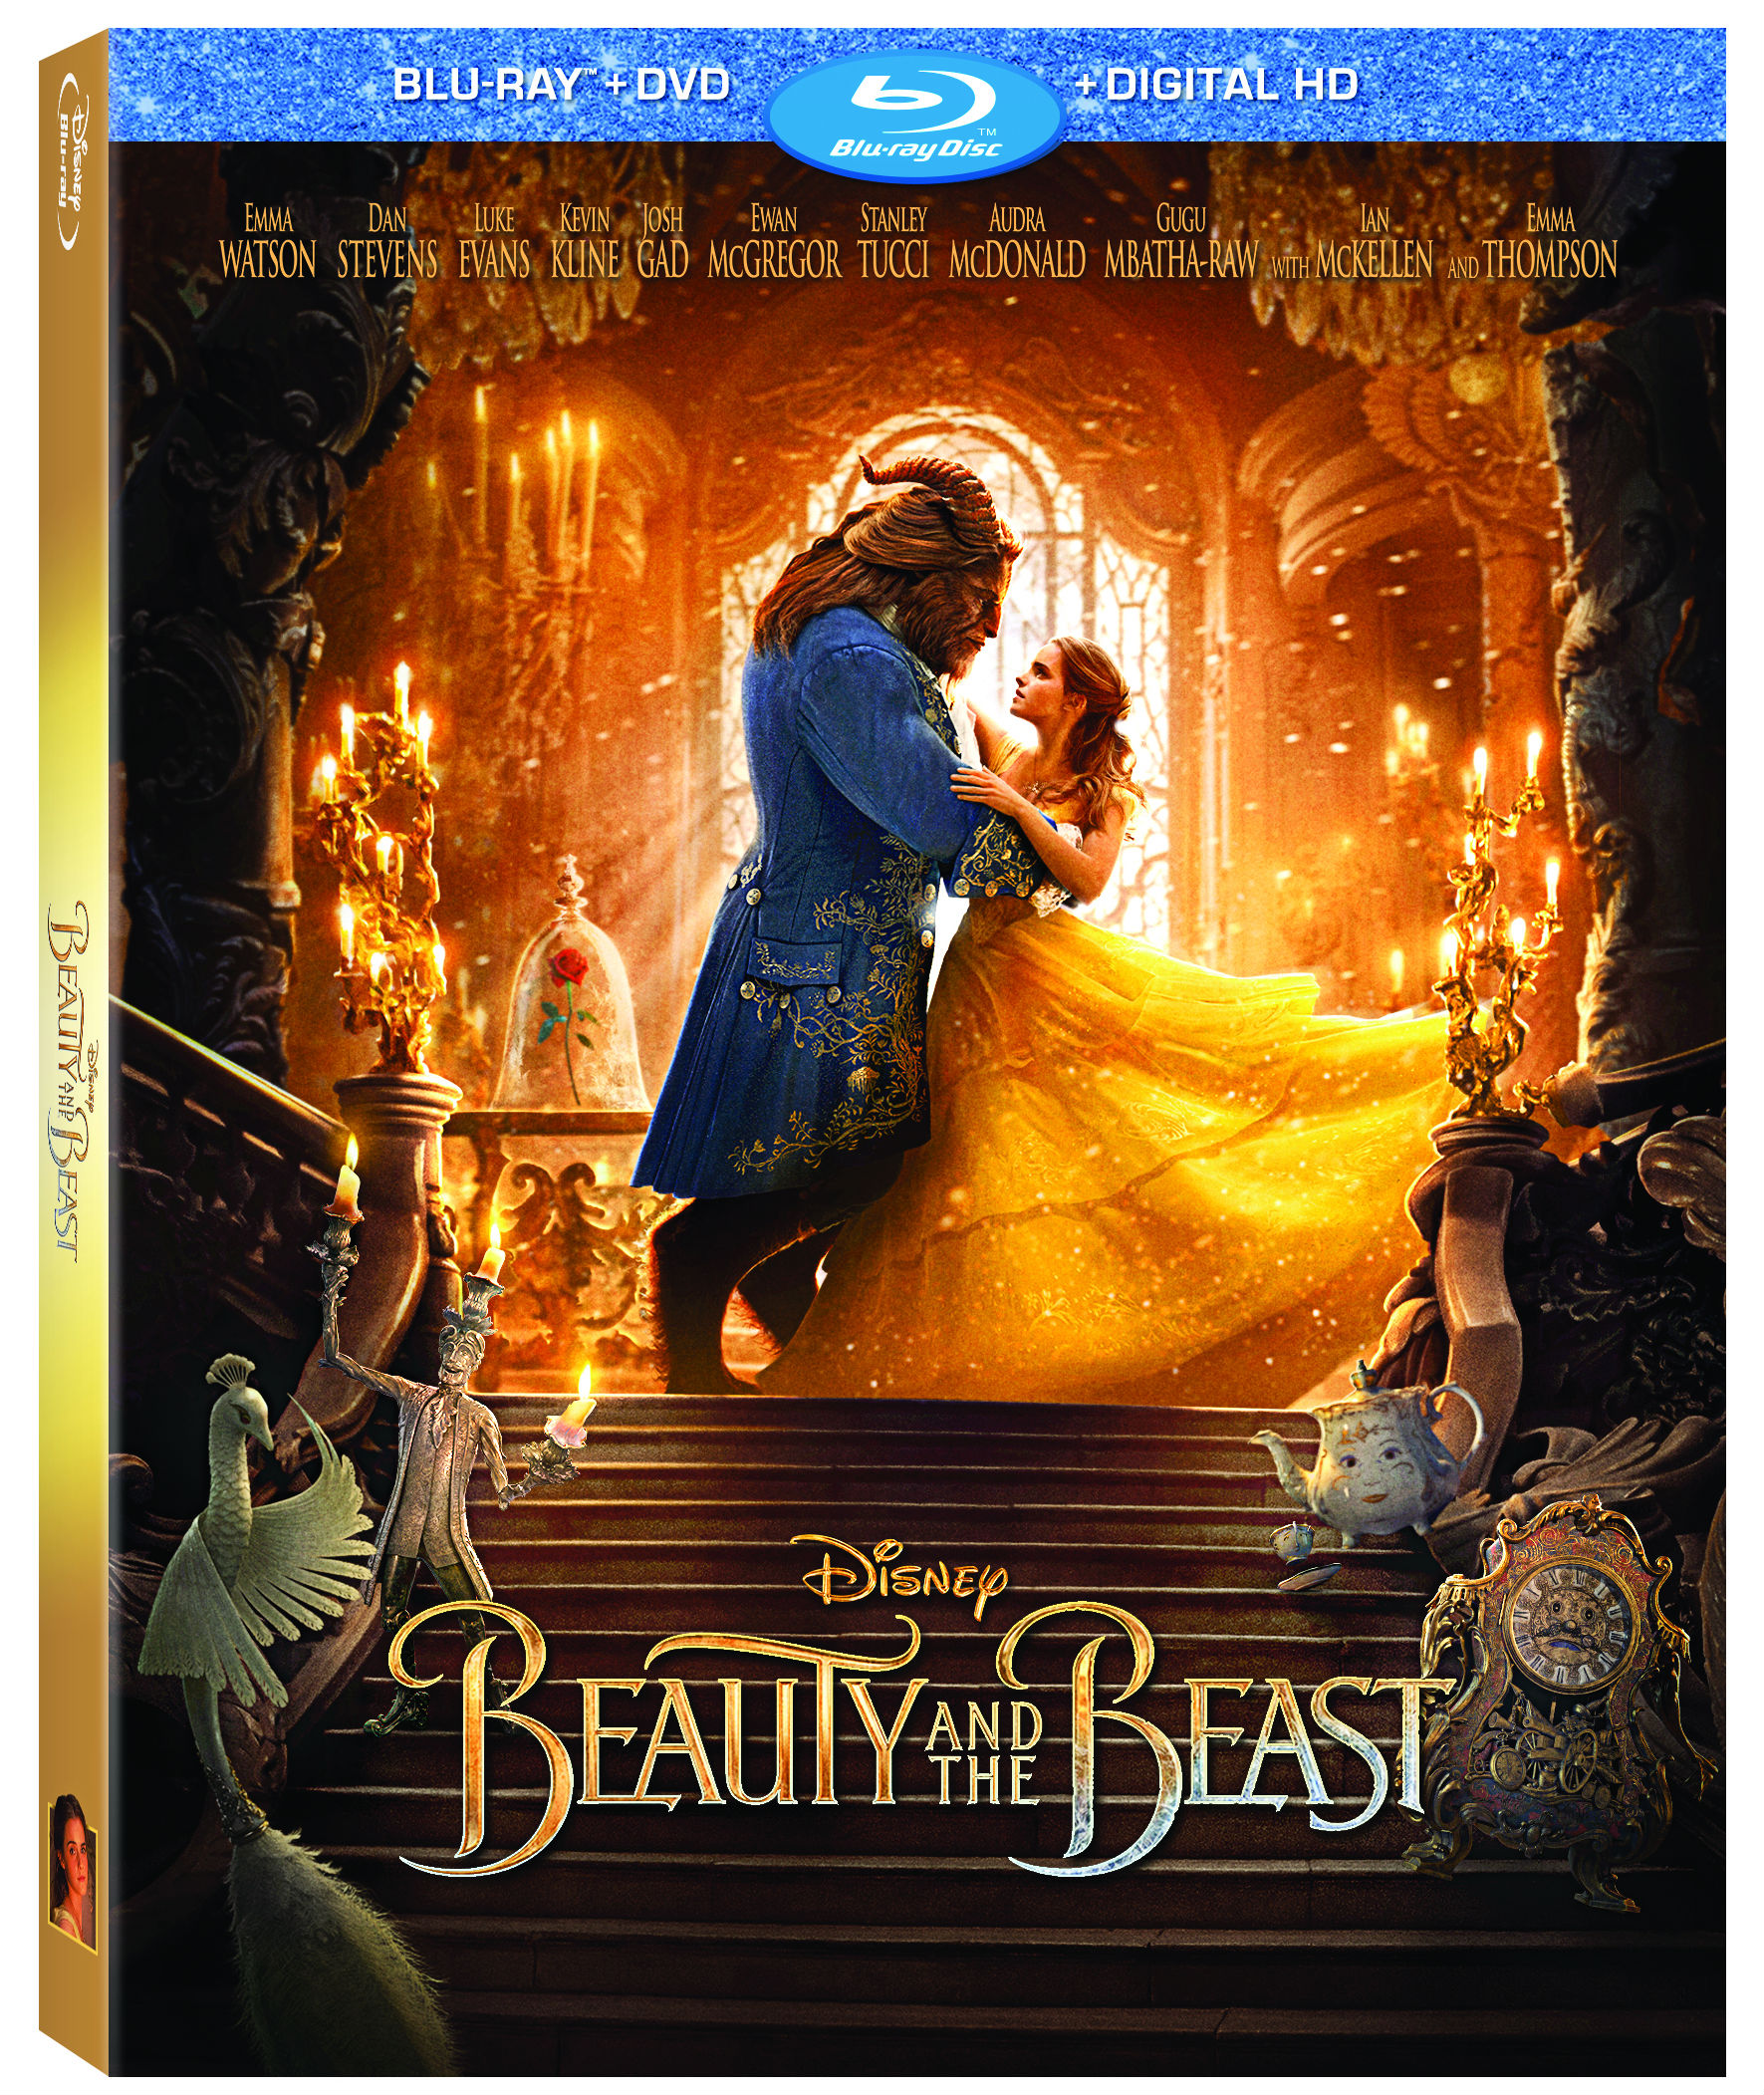 Disney S Beauty And The Beast Hits Digital Hd Blu Ray